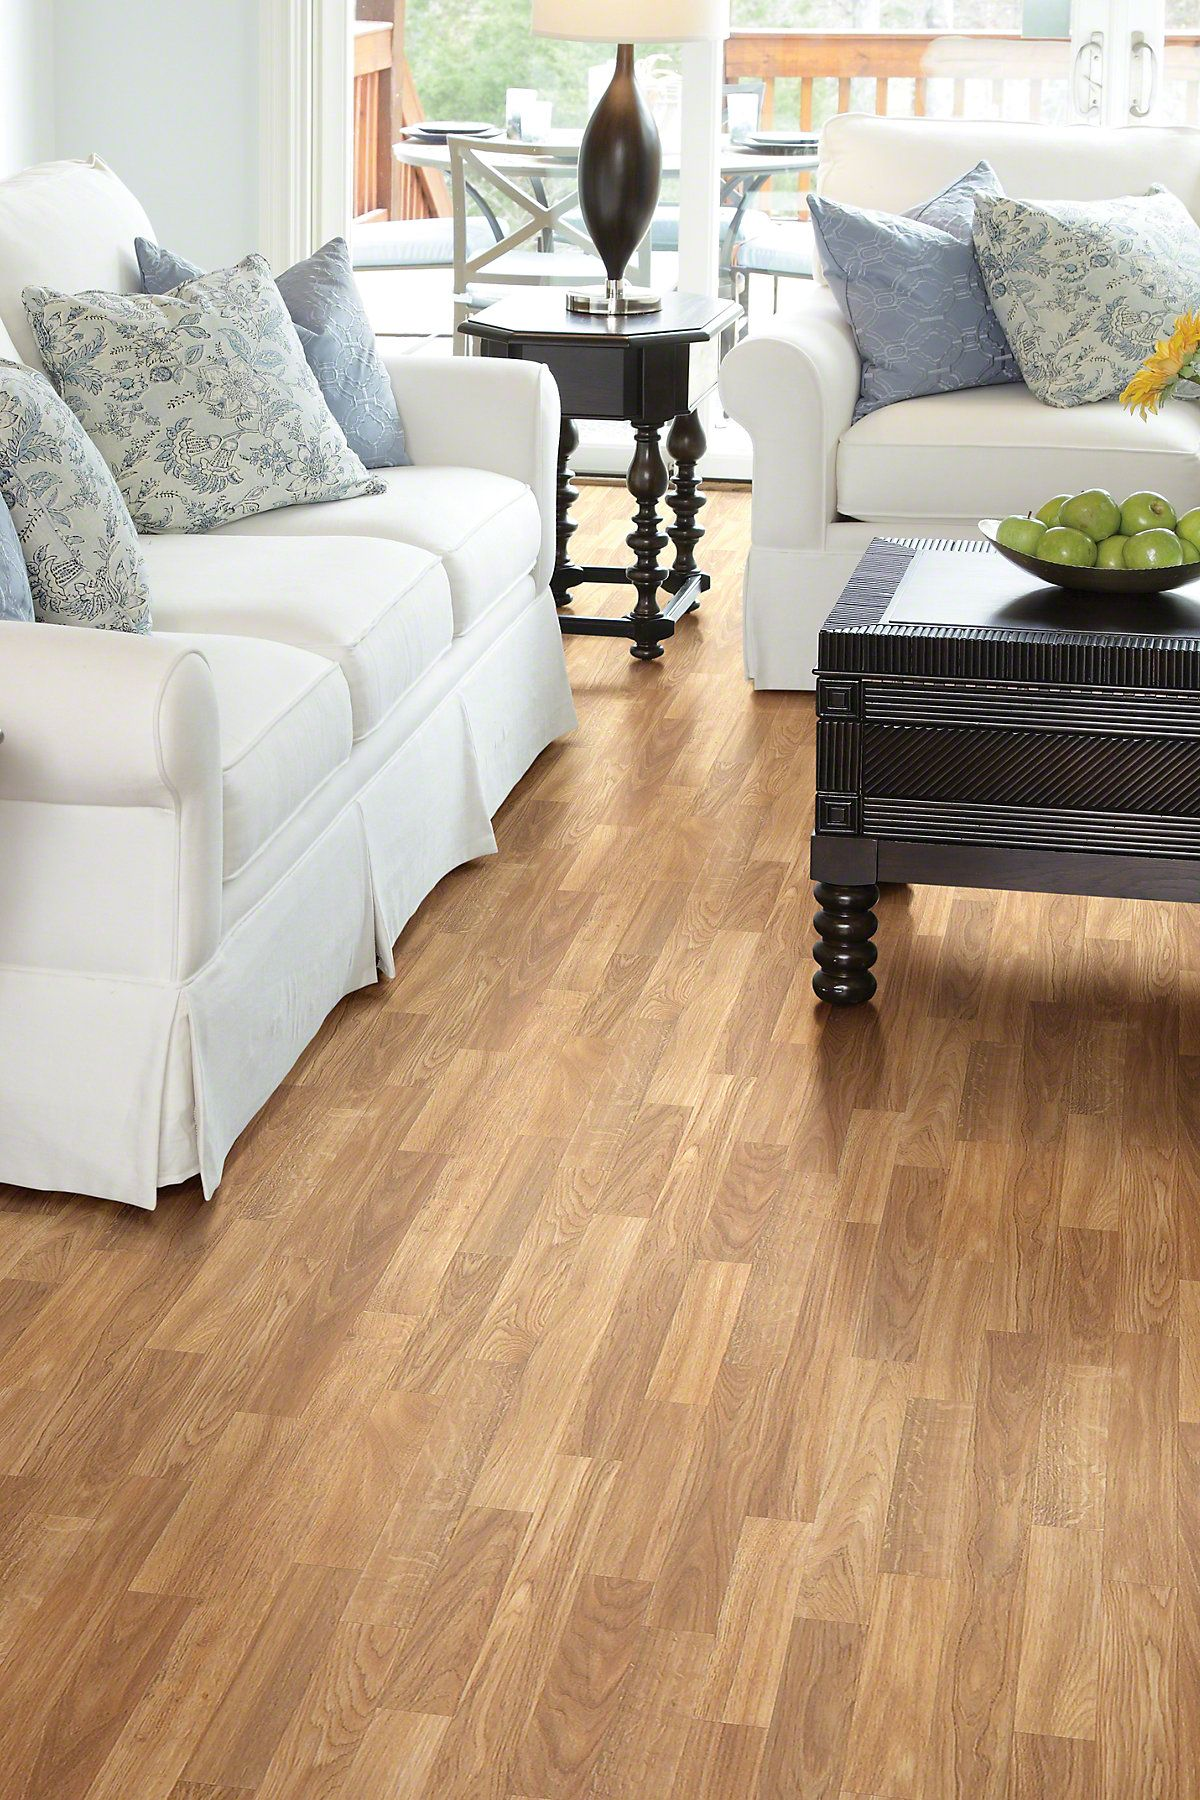 Plateau Fireside (SA60500811) Resilient Sample Flooring